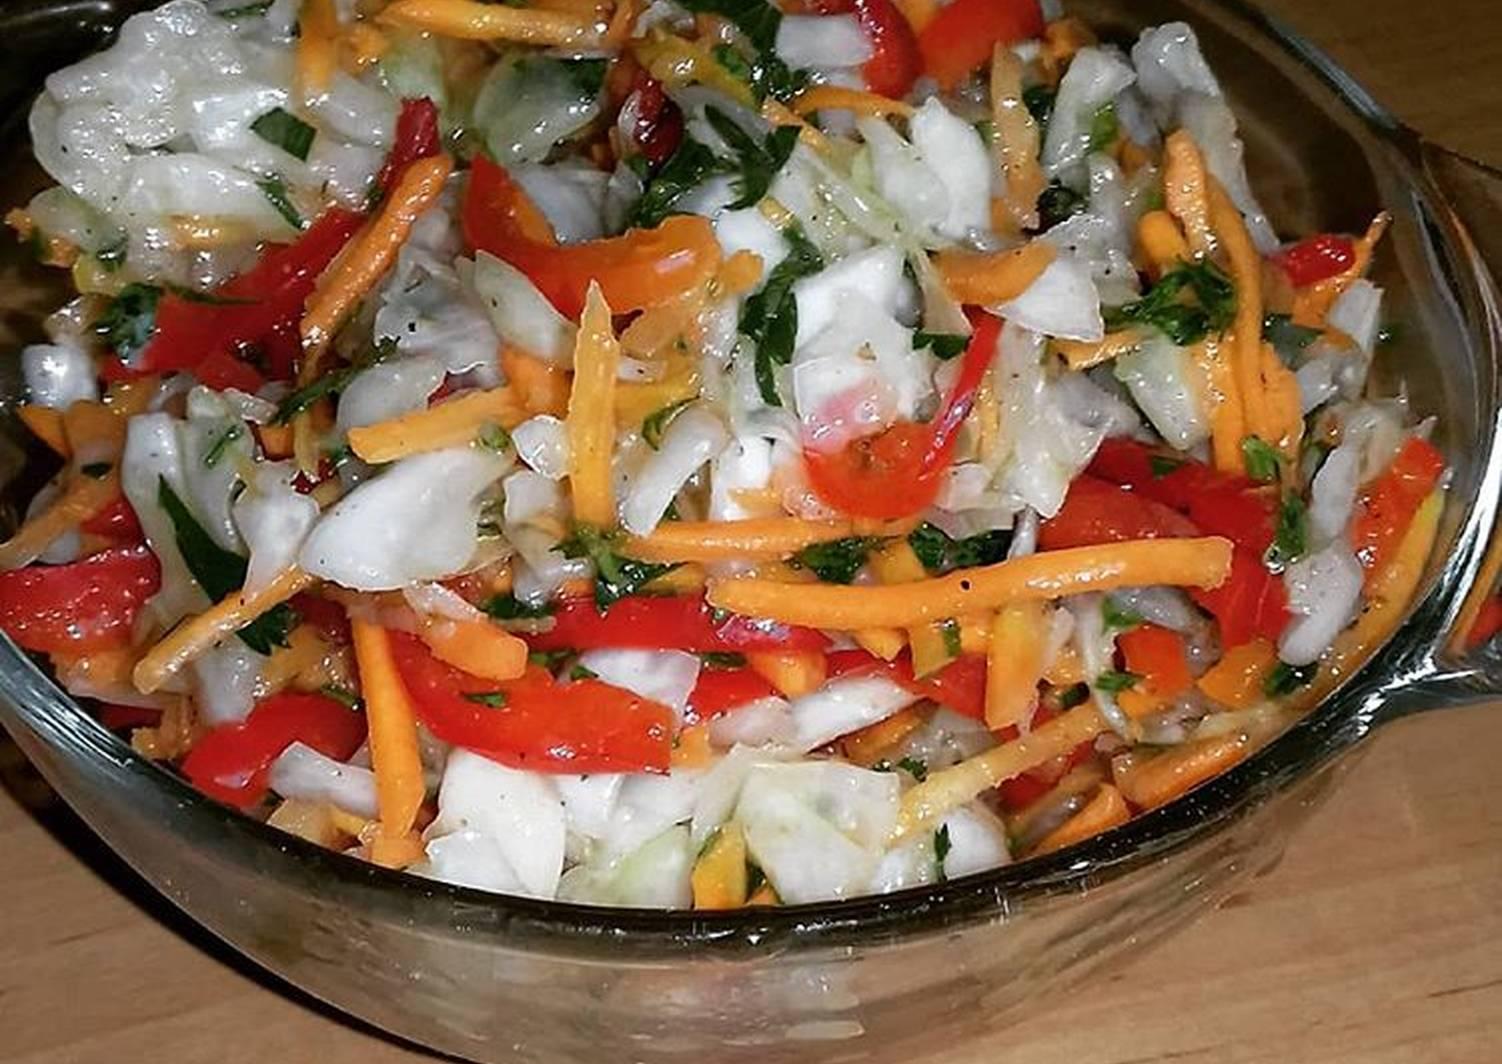 капуста по мексикански рецепт с фото возможности